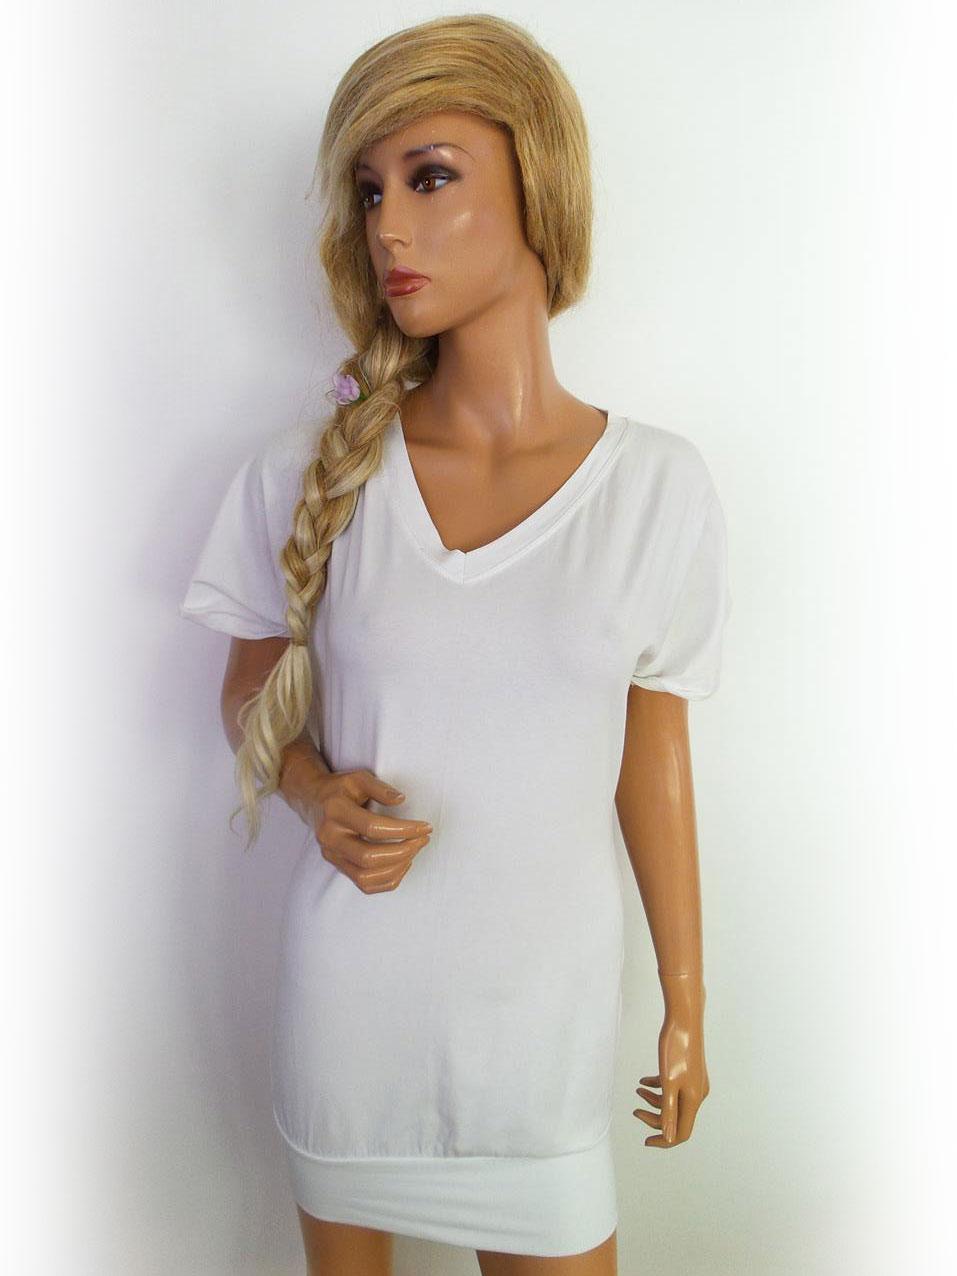 Guarapo-Womens-Frauen-Dame-Groesse-S-Neu-White-Shift-Kleid-Kurze-Armel